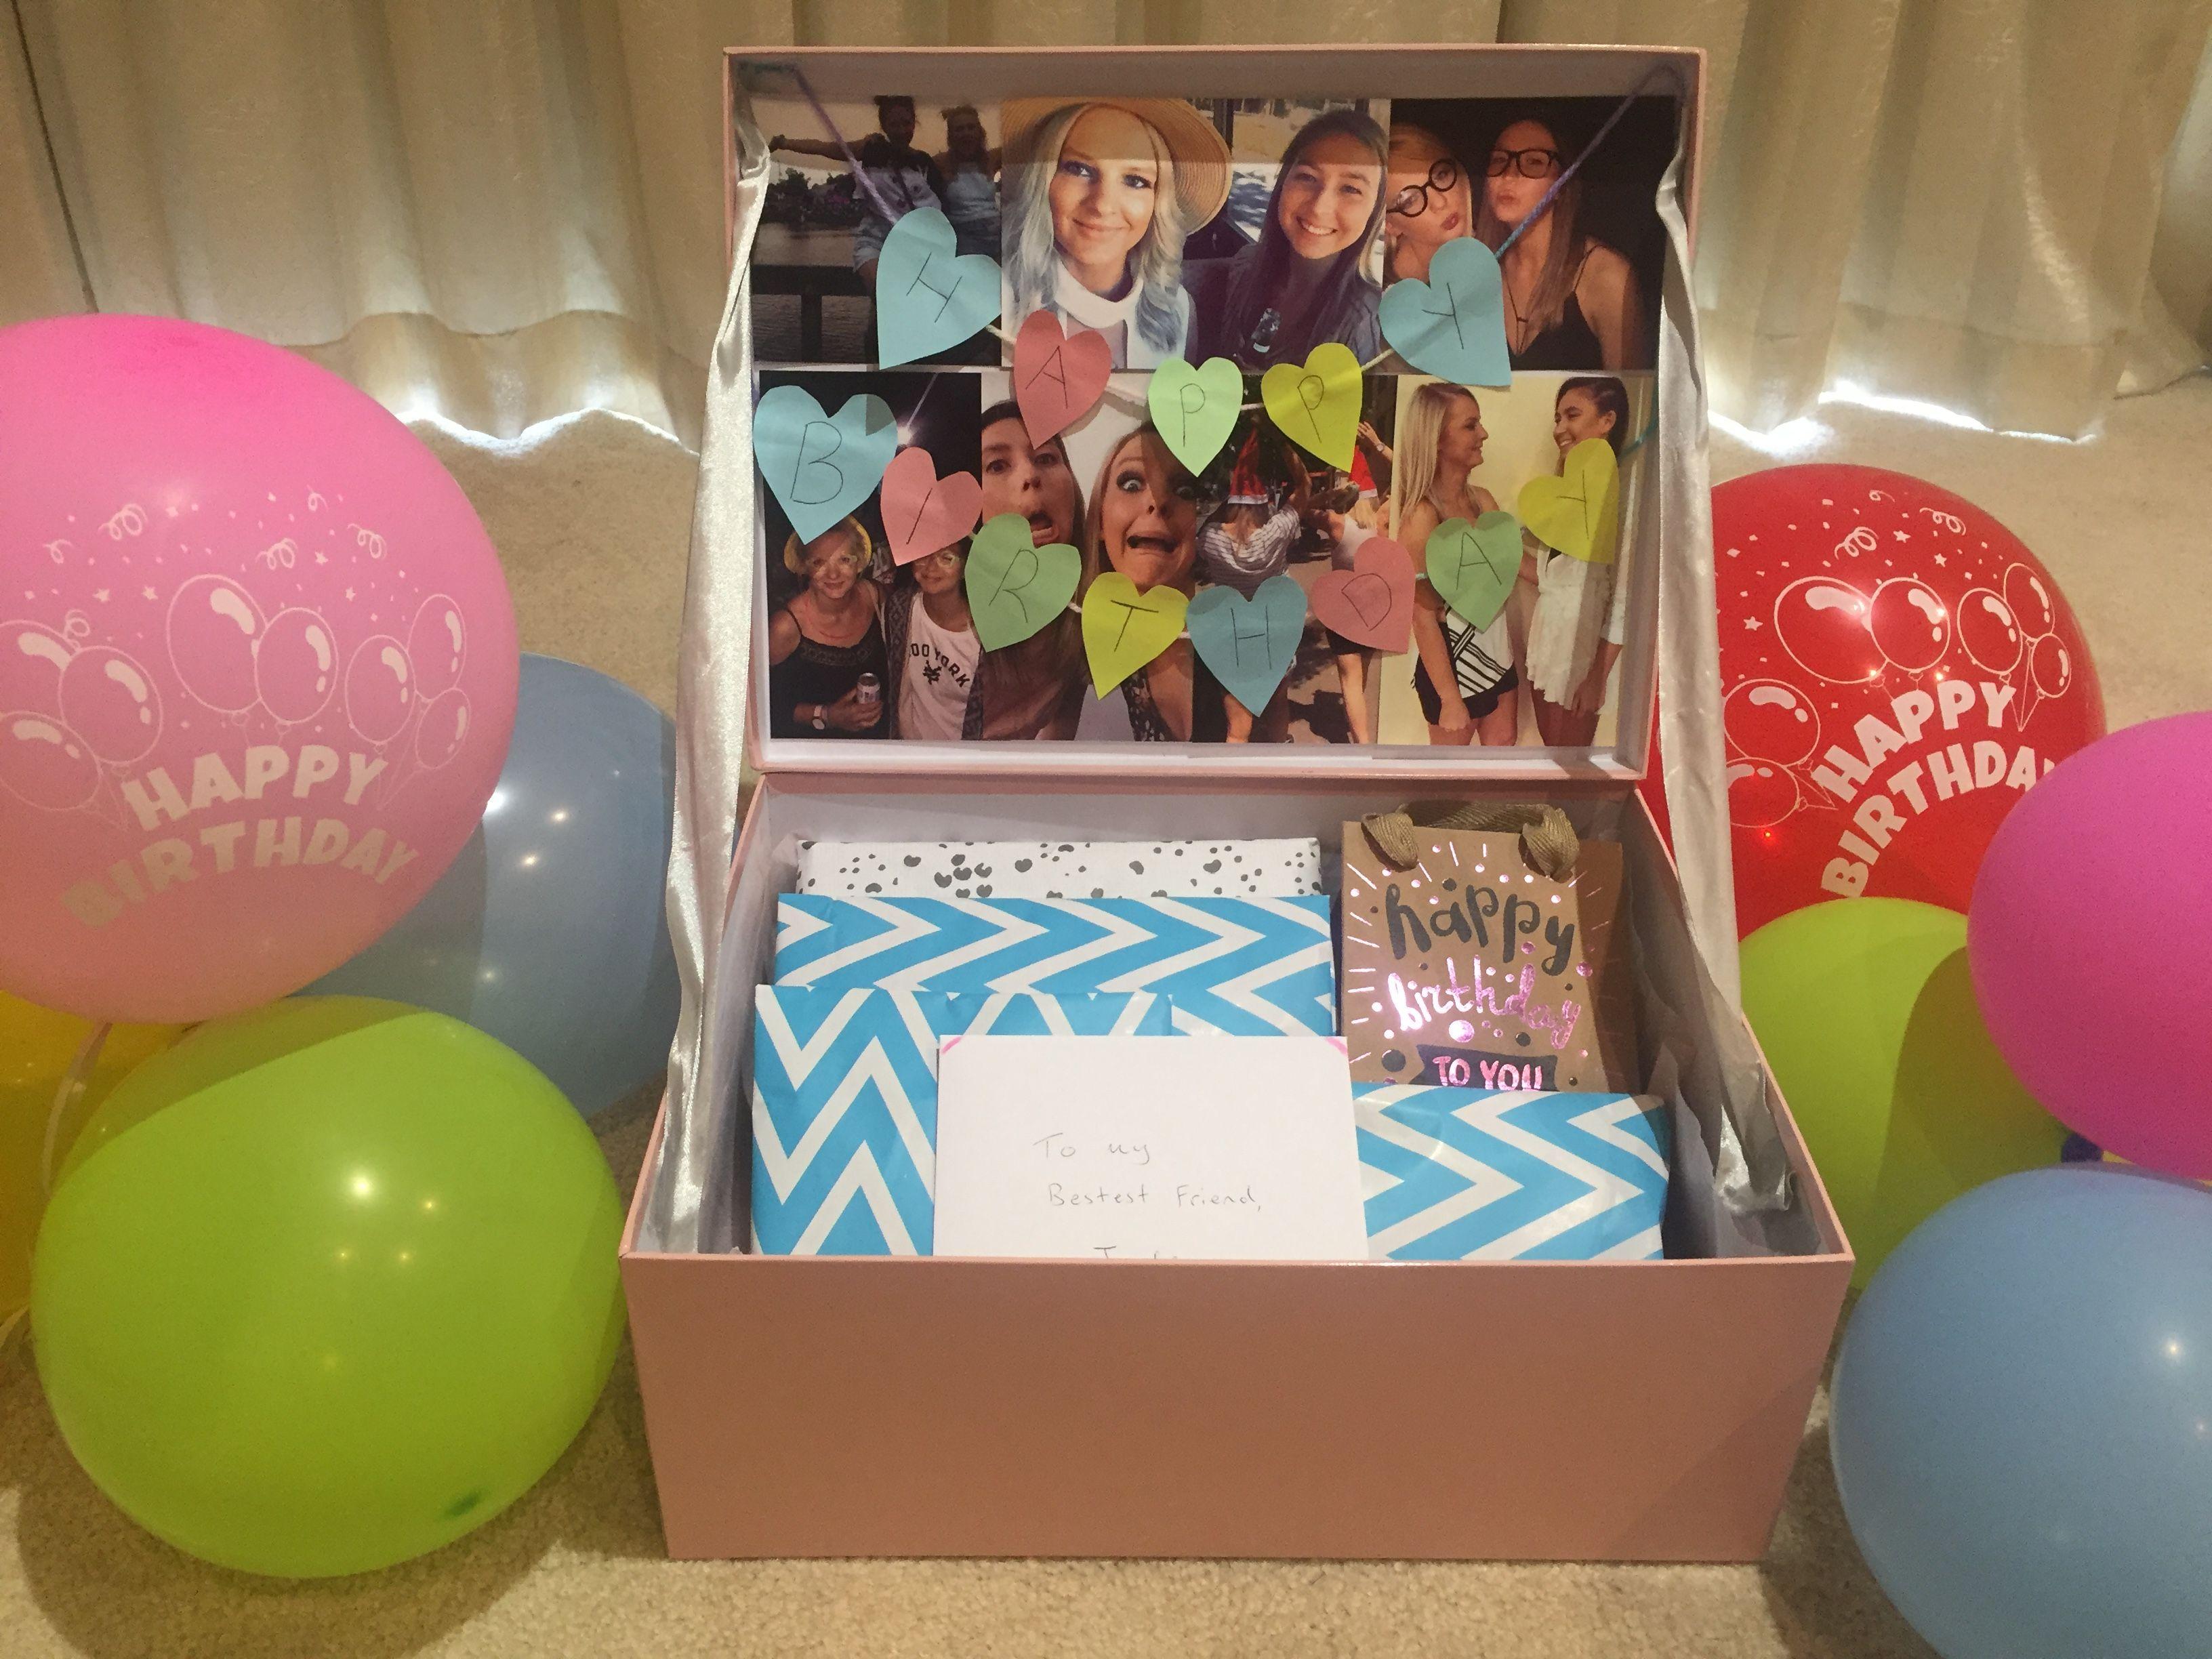 25th Birthday Gift Ideas For Best Friend 2021